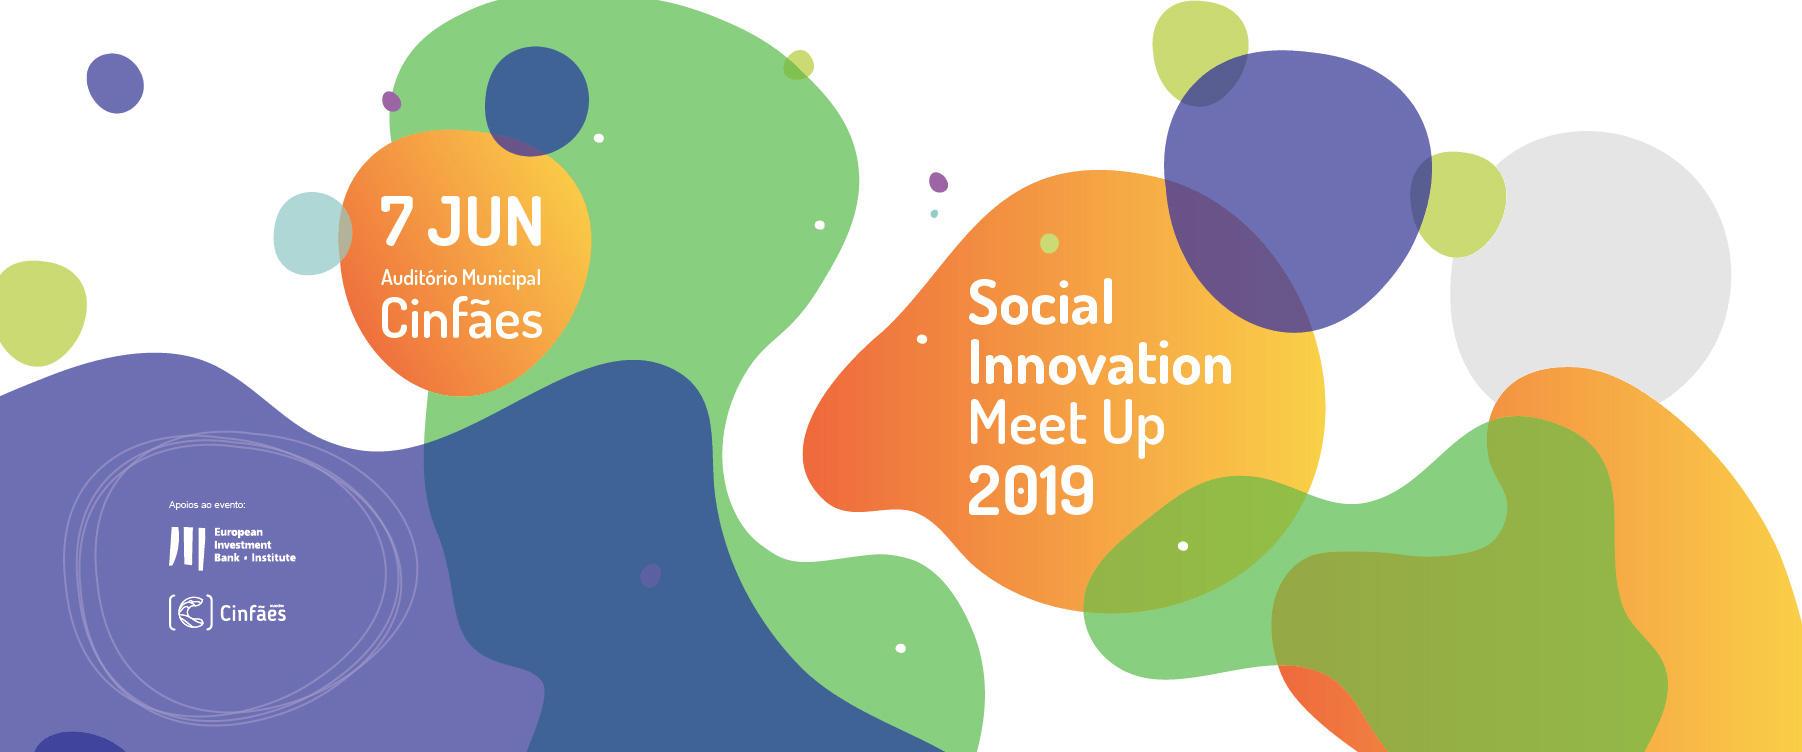 Iris Social Innovation Meet Up 2019 Eib Institute